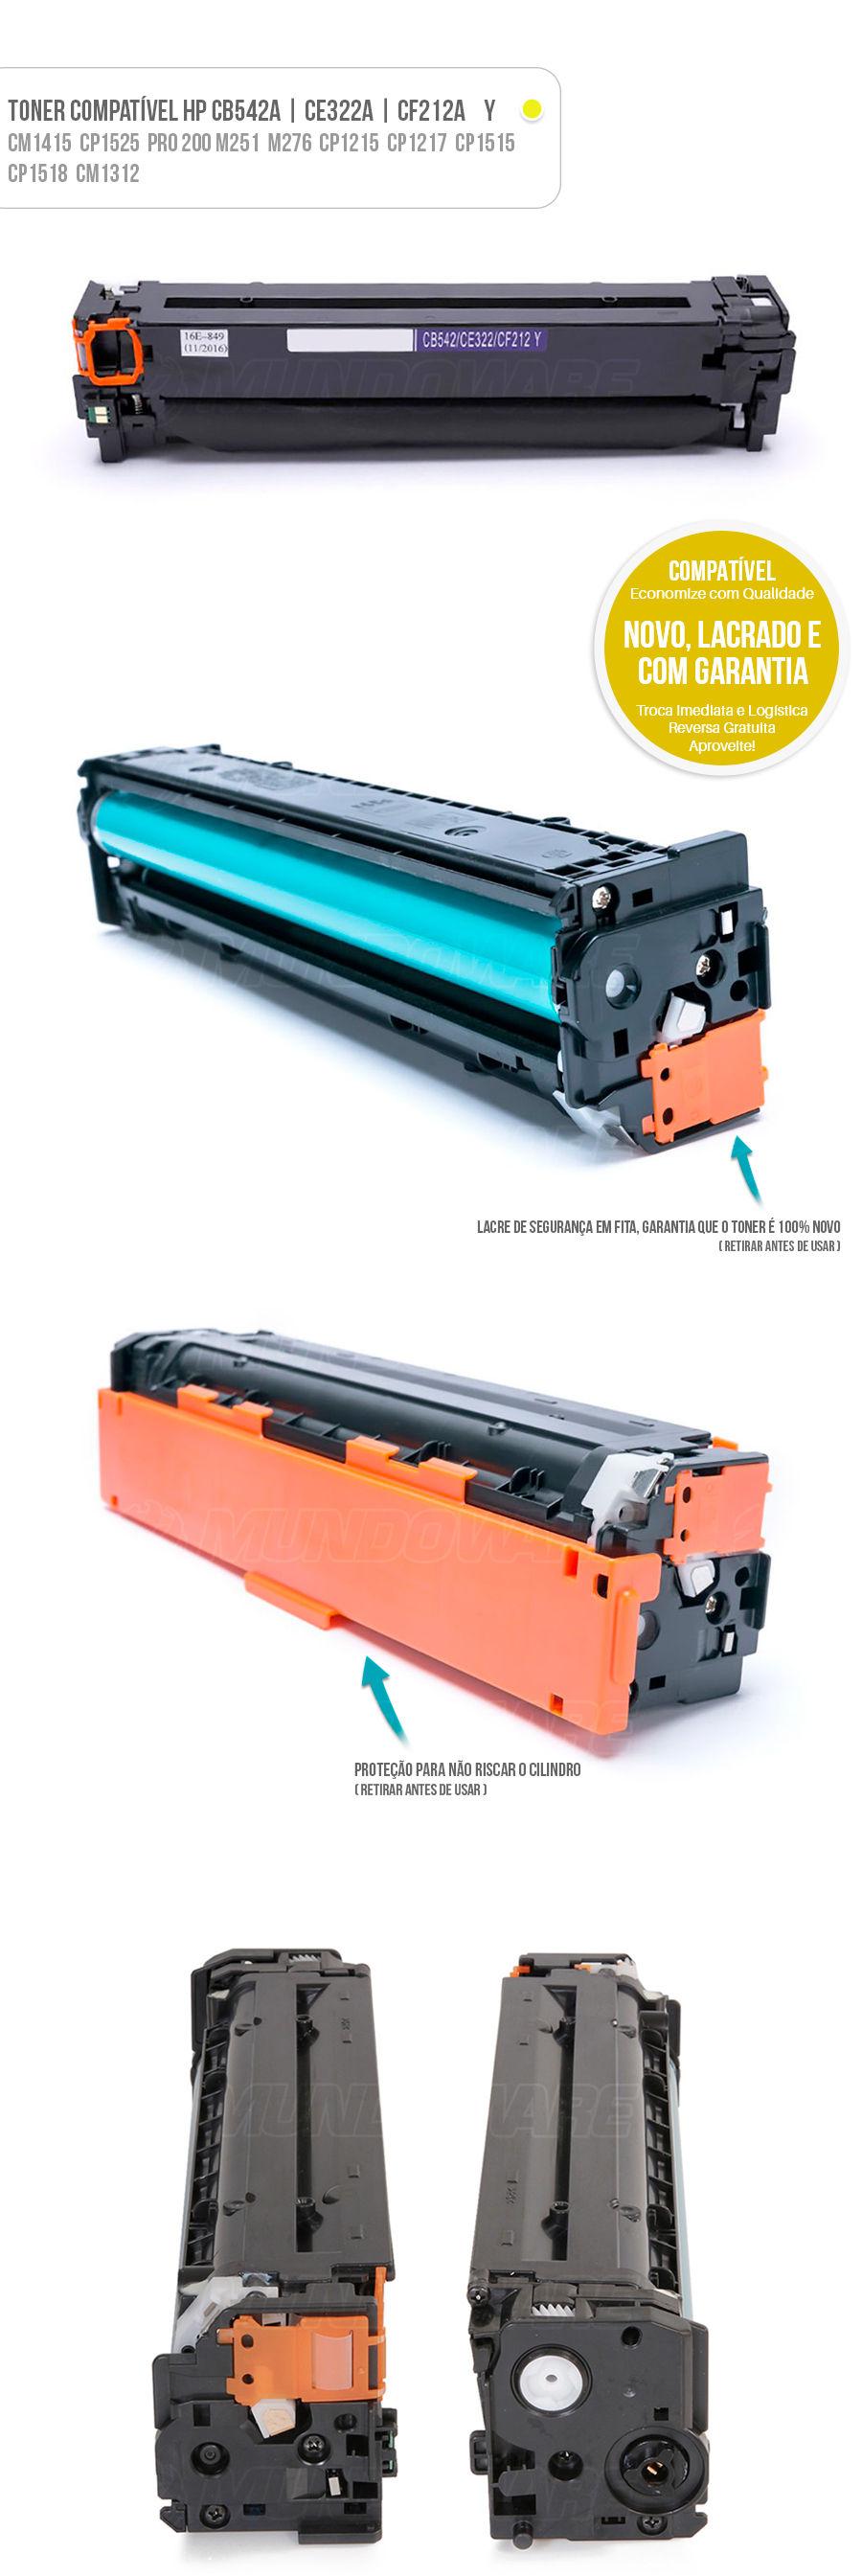 CP1215 CM1312 CM1415 CP1510 CP1525 CP1515 Pro200 M251 M251NW M276 M276N Tonner Colorido Color HP